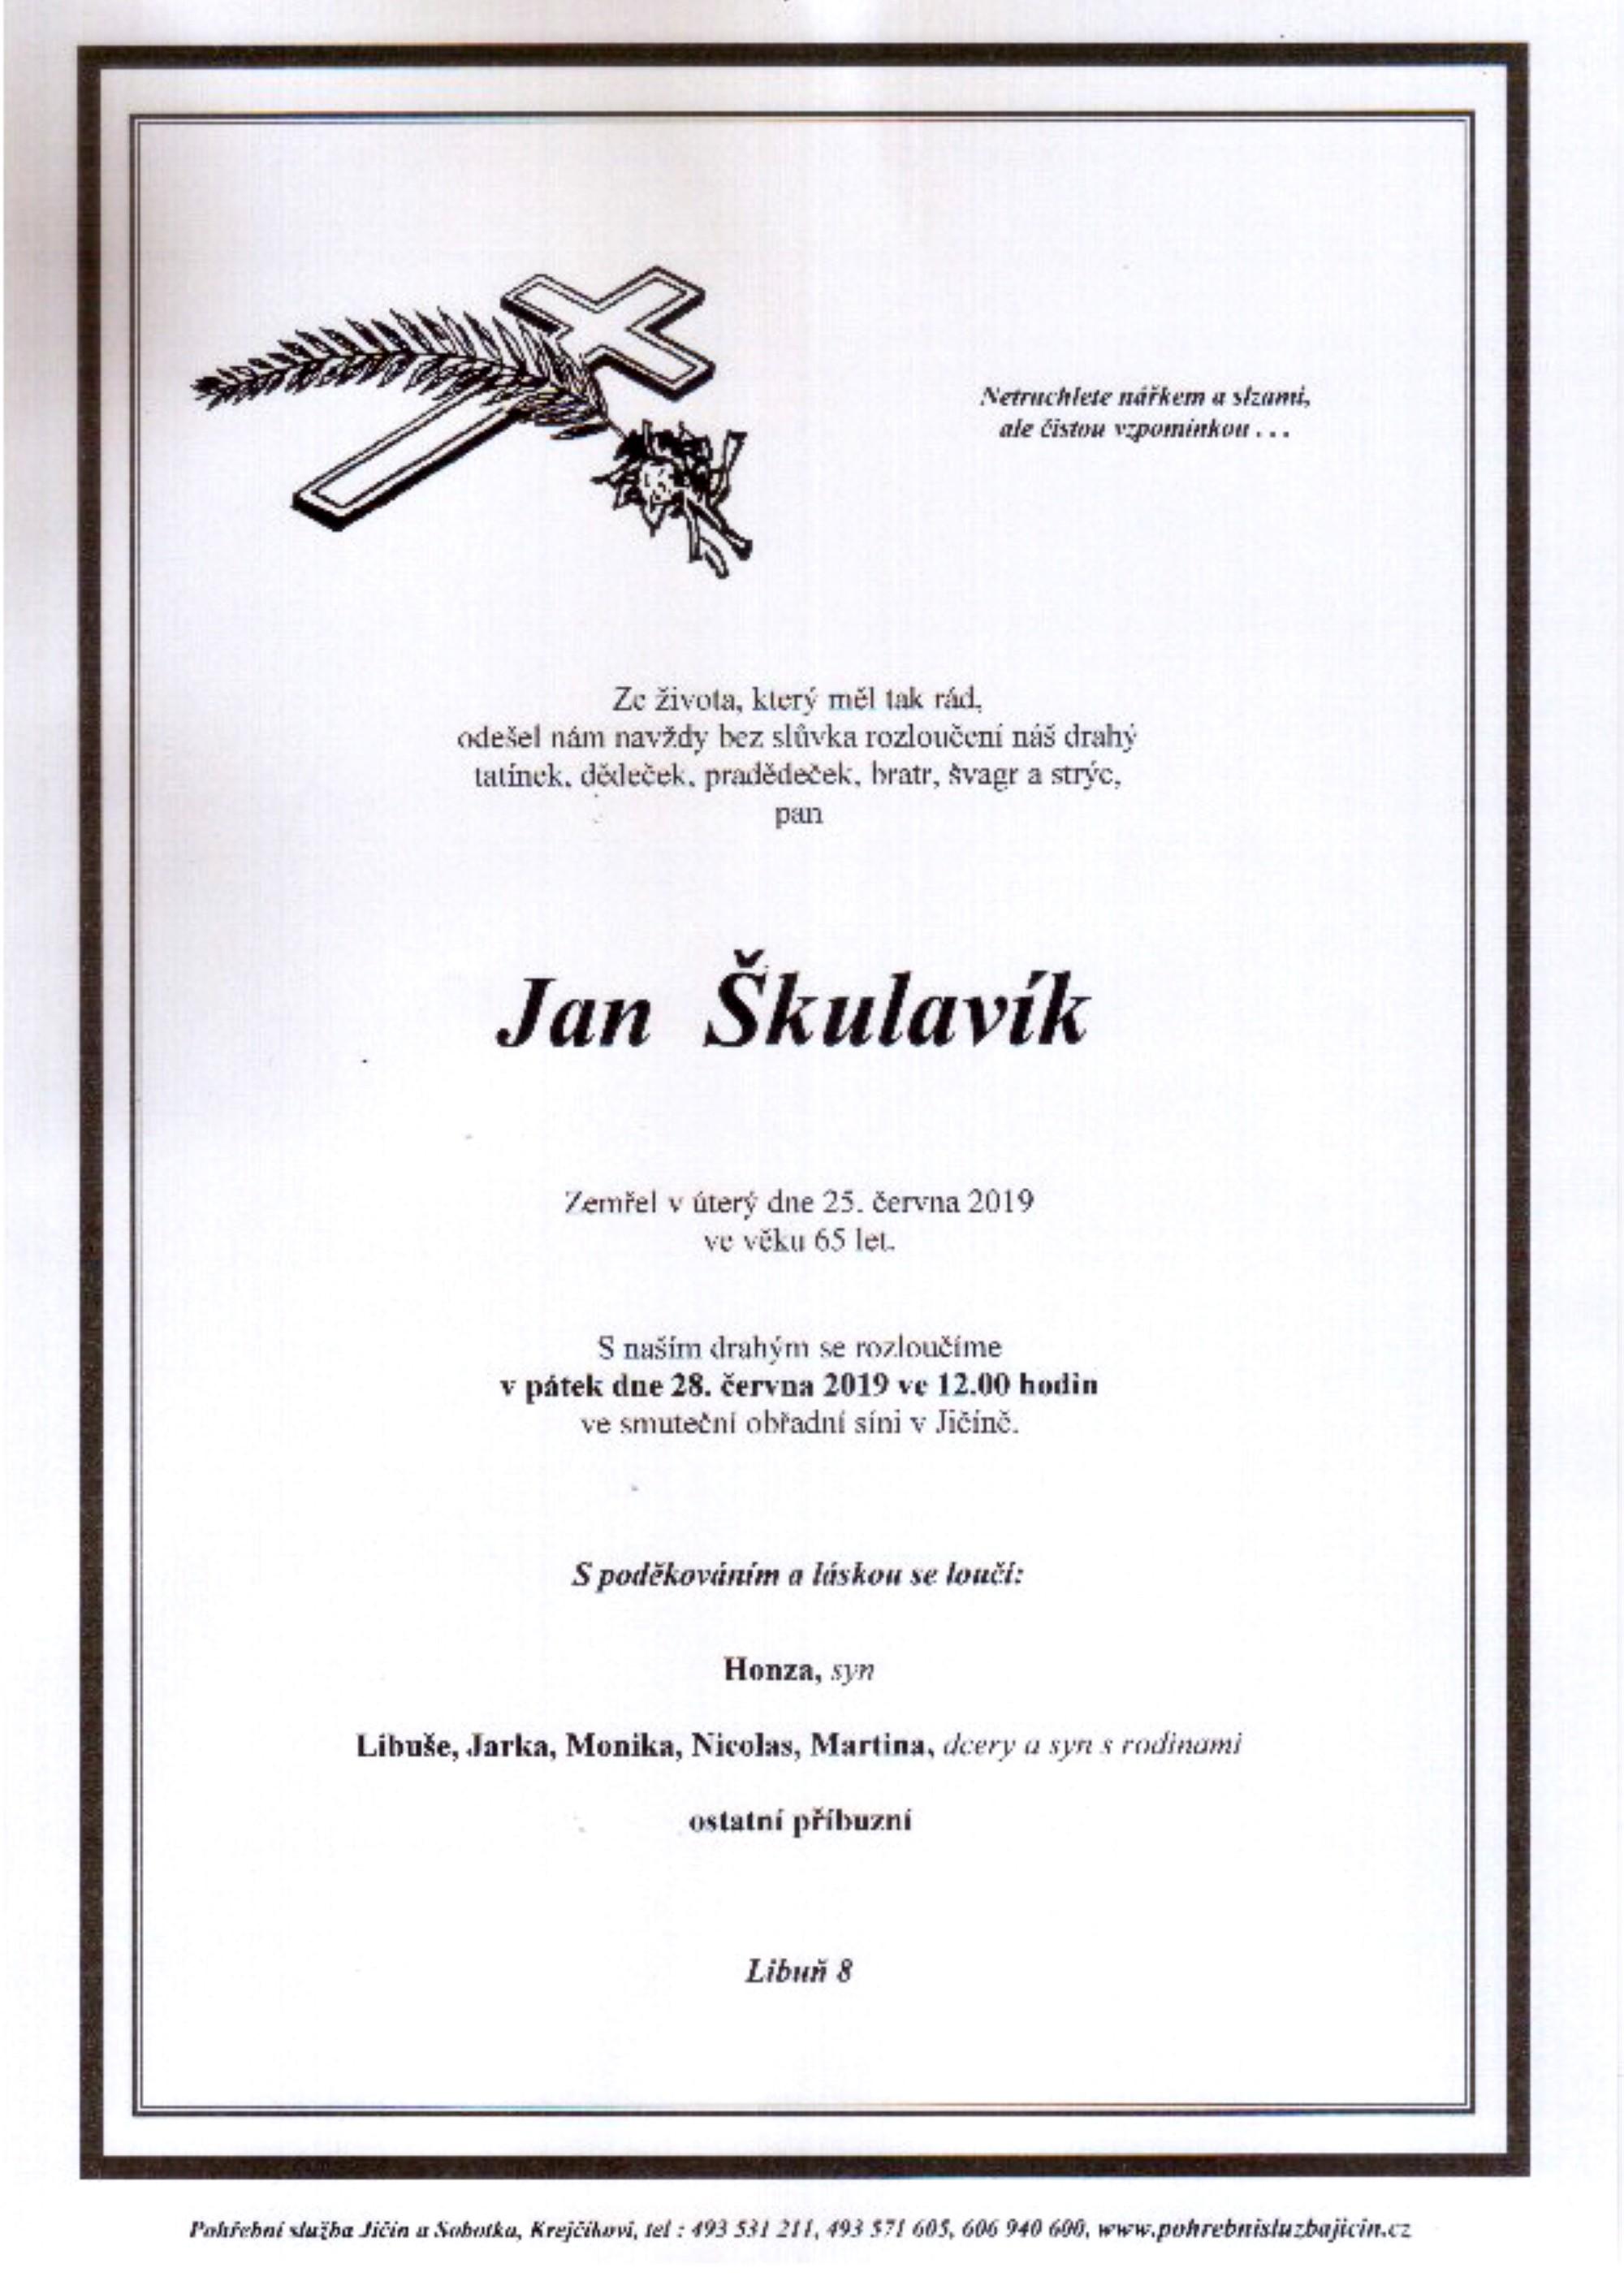 Jan Škulavík